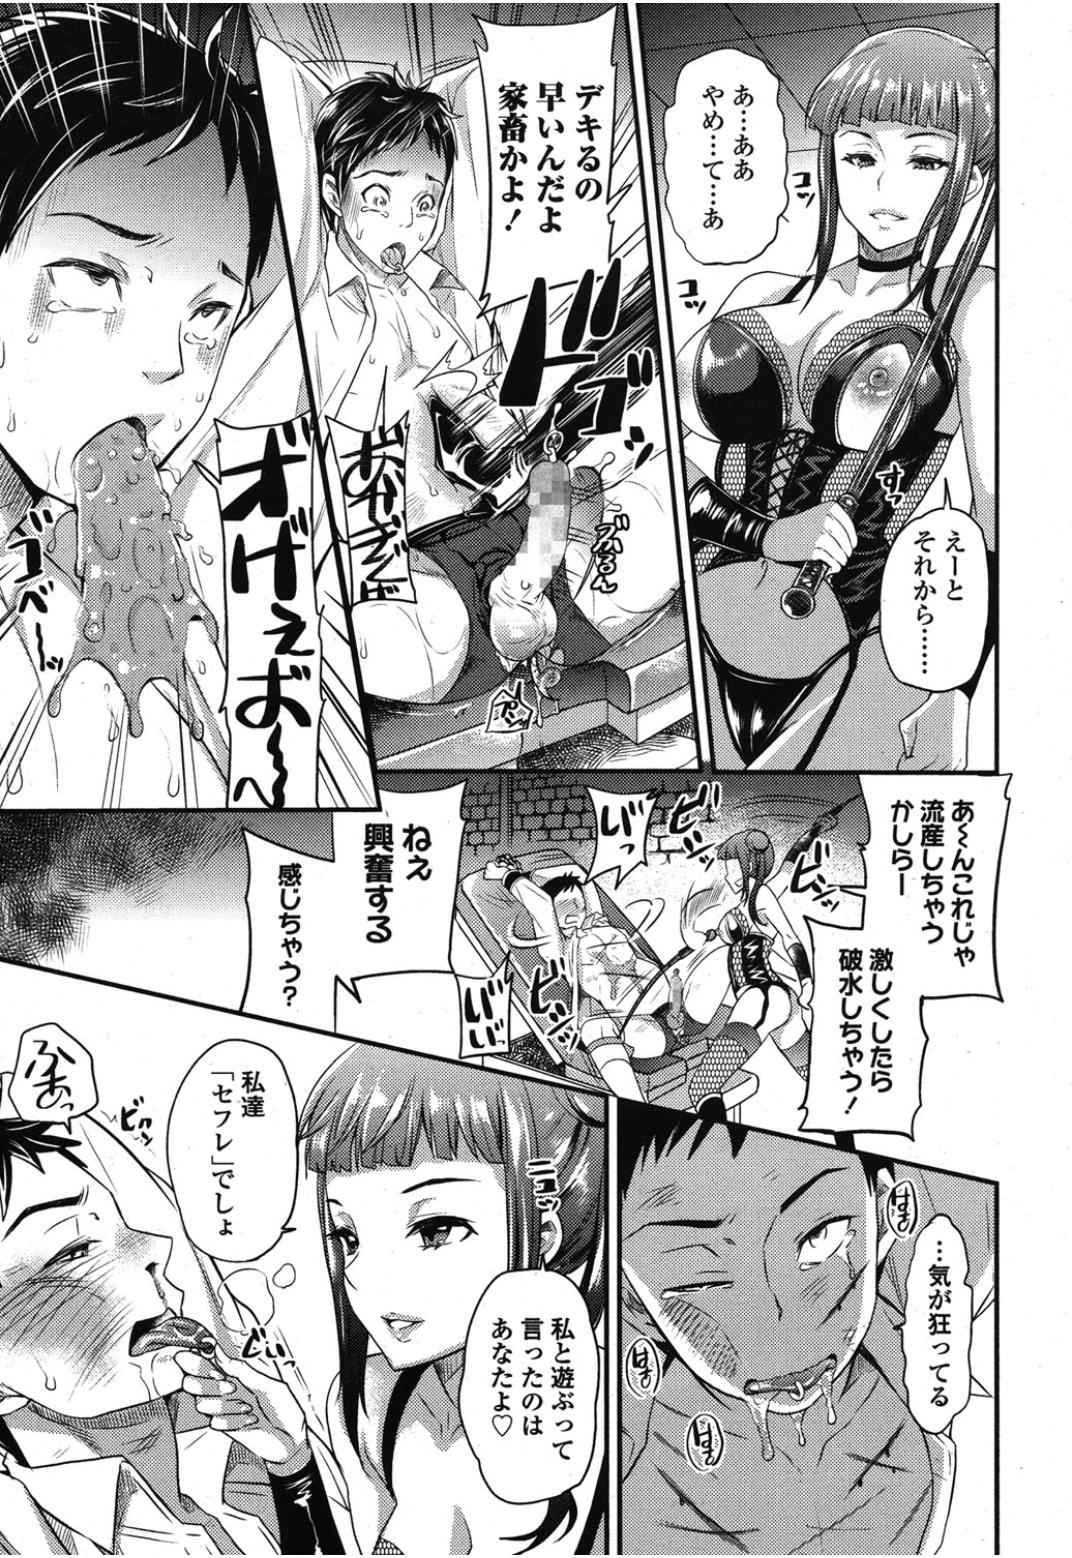 Girls forM Vol. 08 279